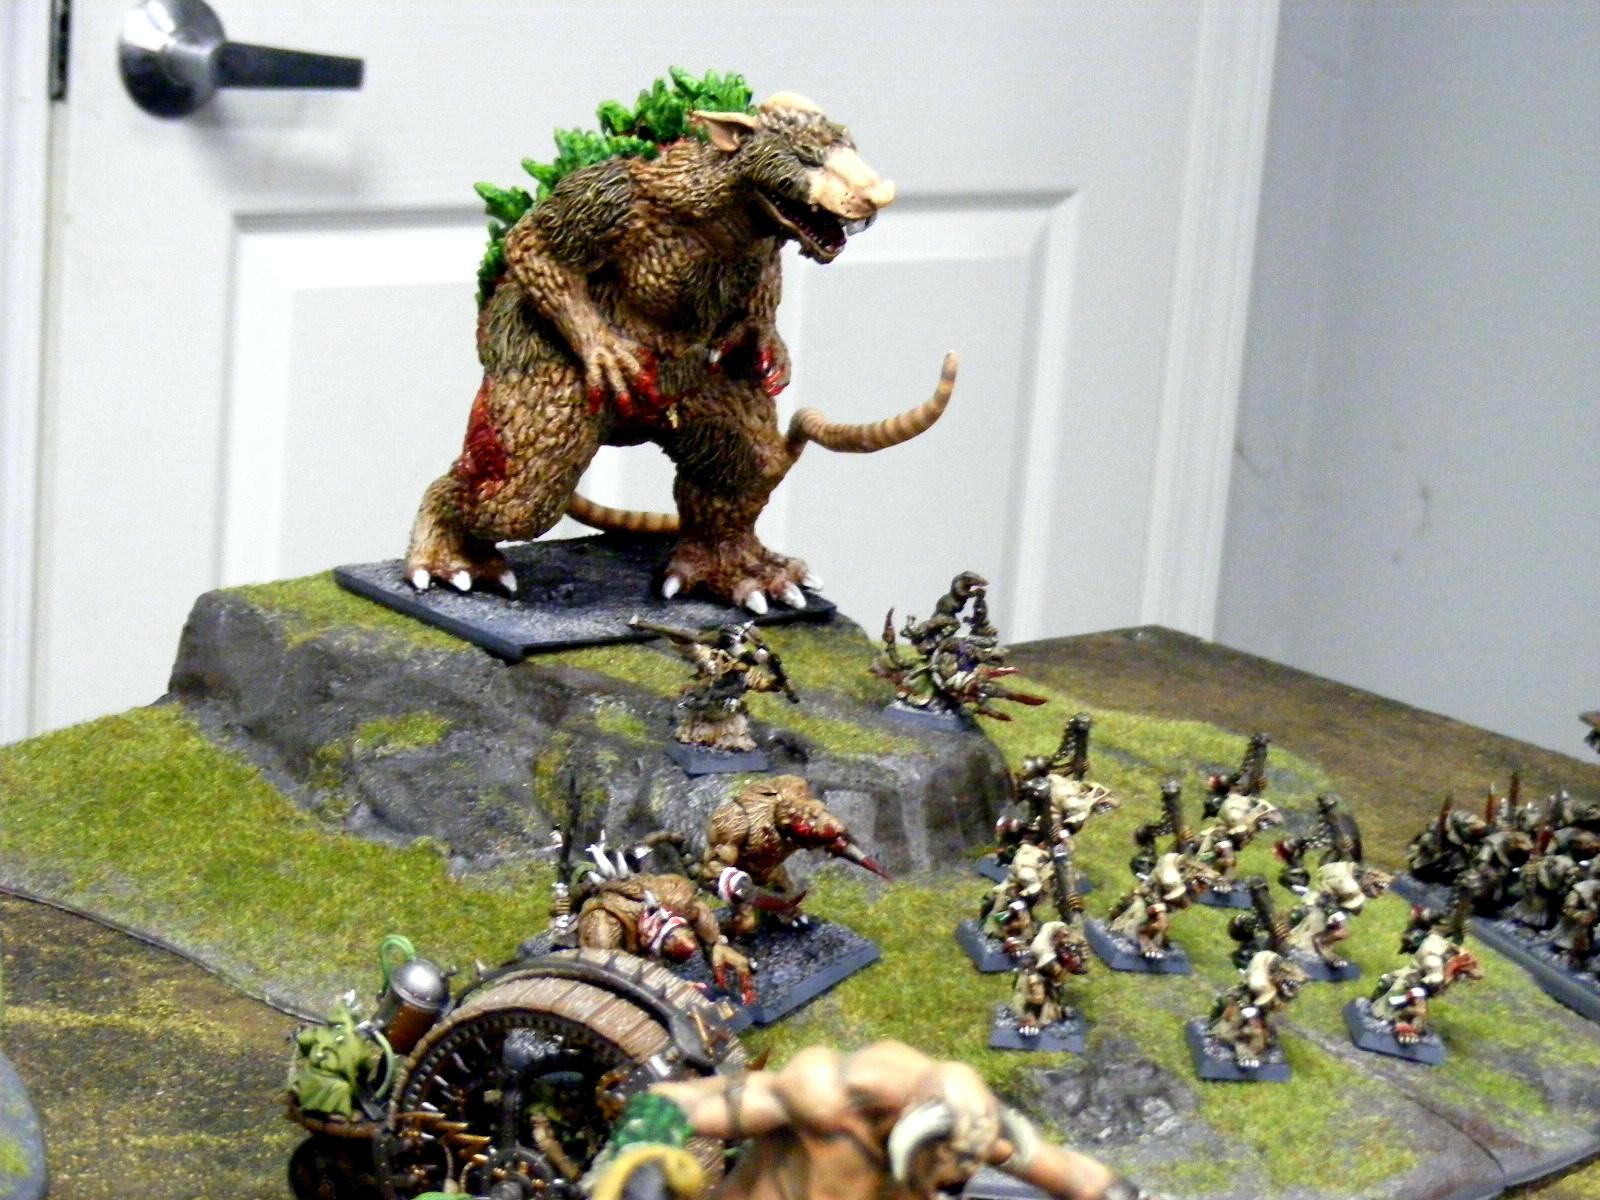 Abomination, Daemons, Godzilla, Massive, Painted, Skaven, Warhammer Fantasy